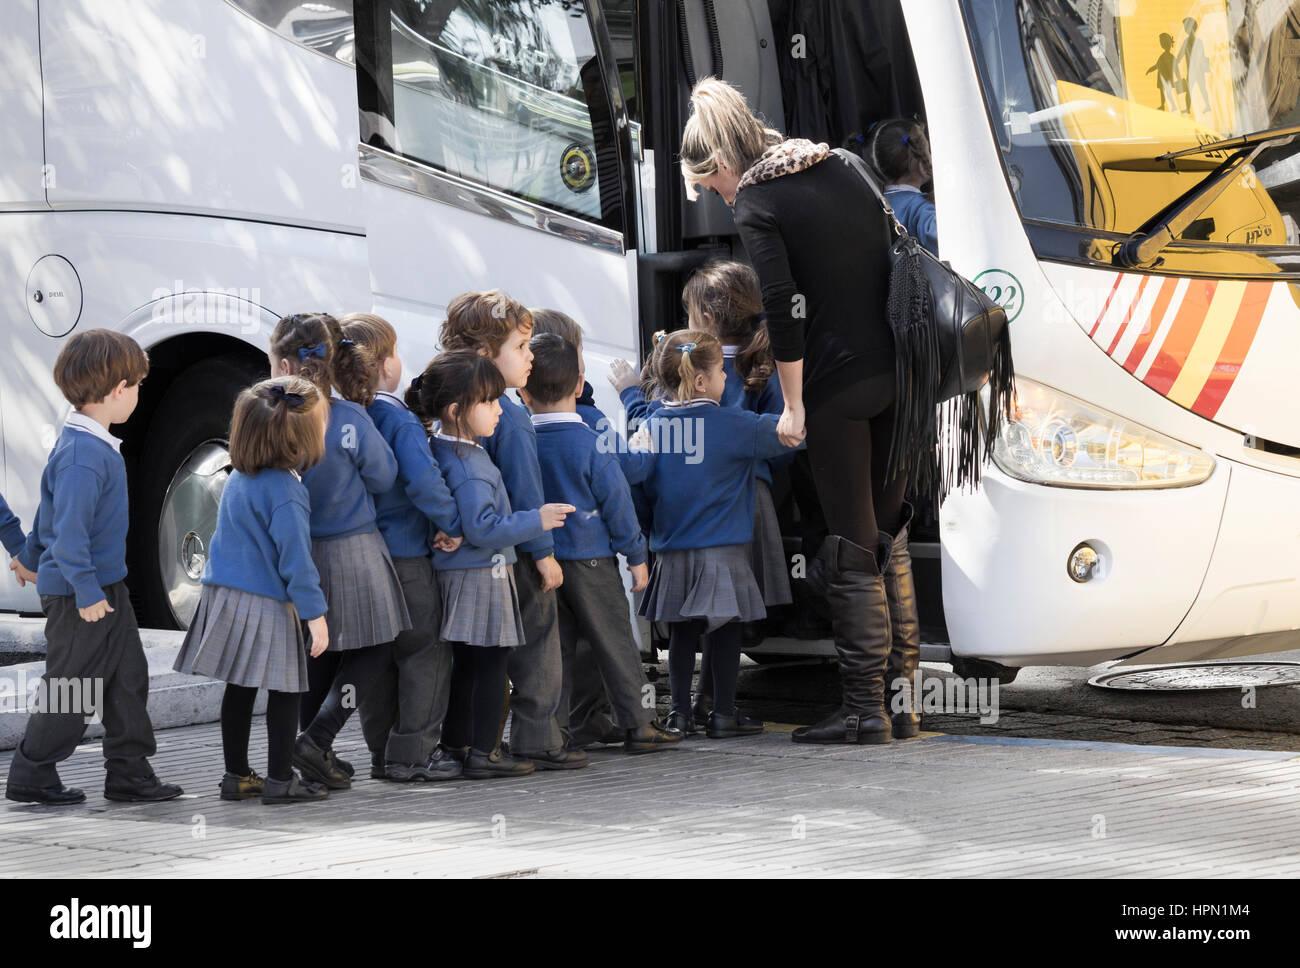 Spanish schoolchildren and school bus. Spain - Stock Image